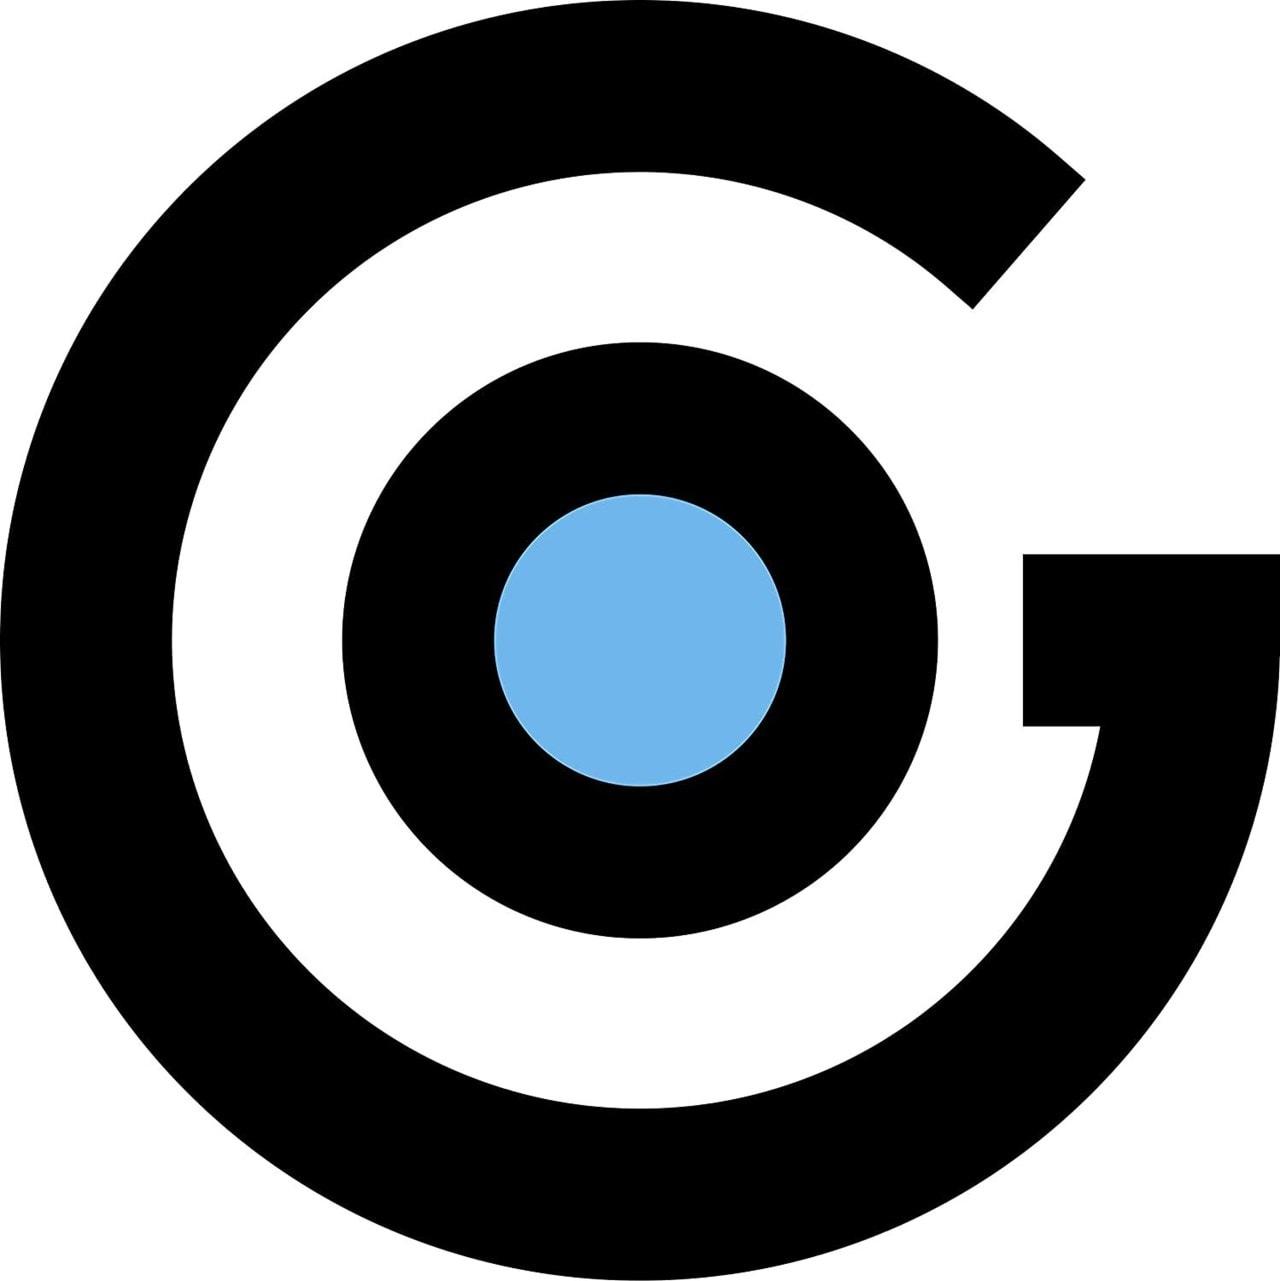 Go - 1